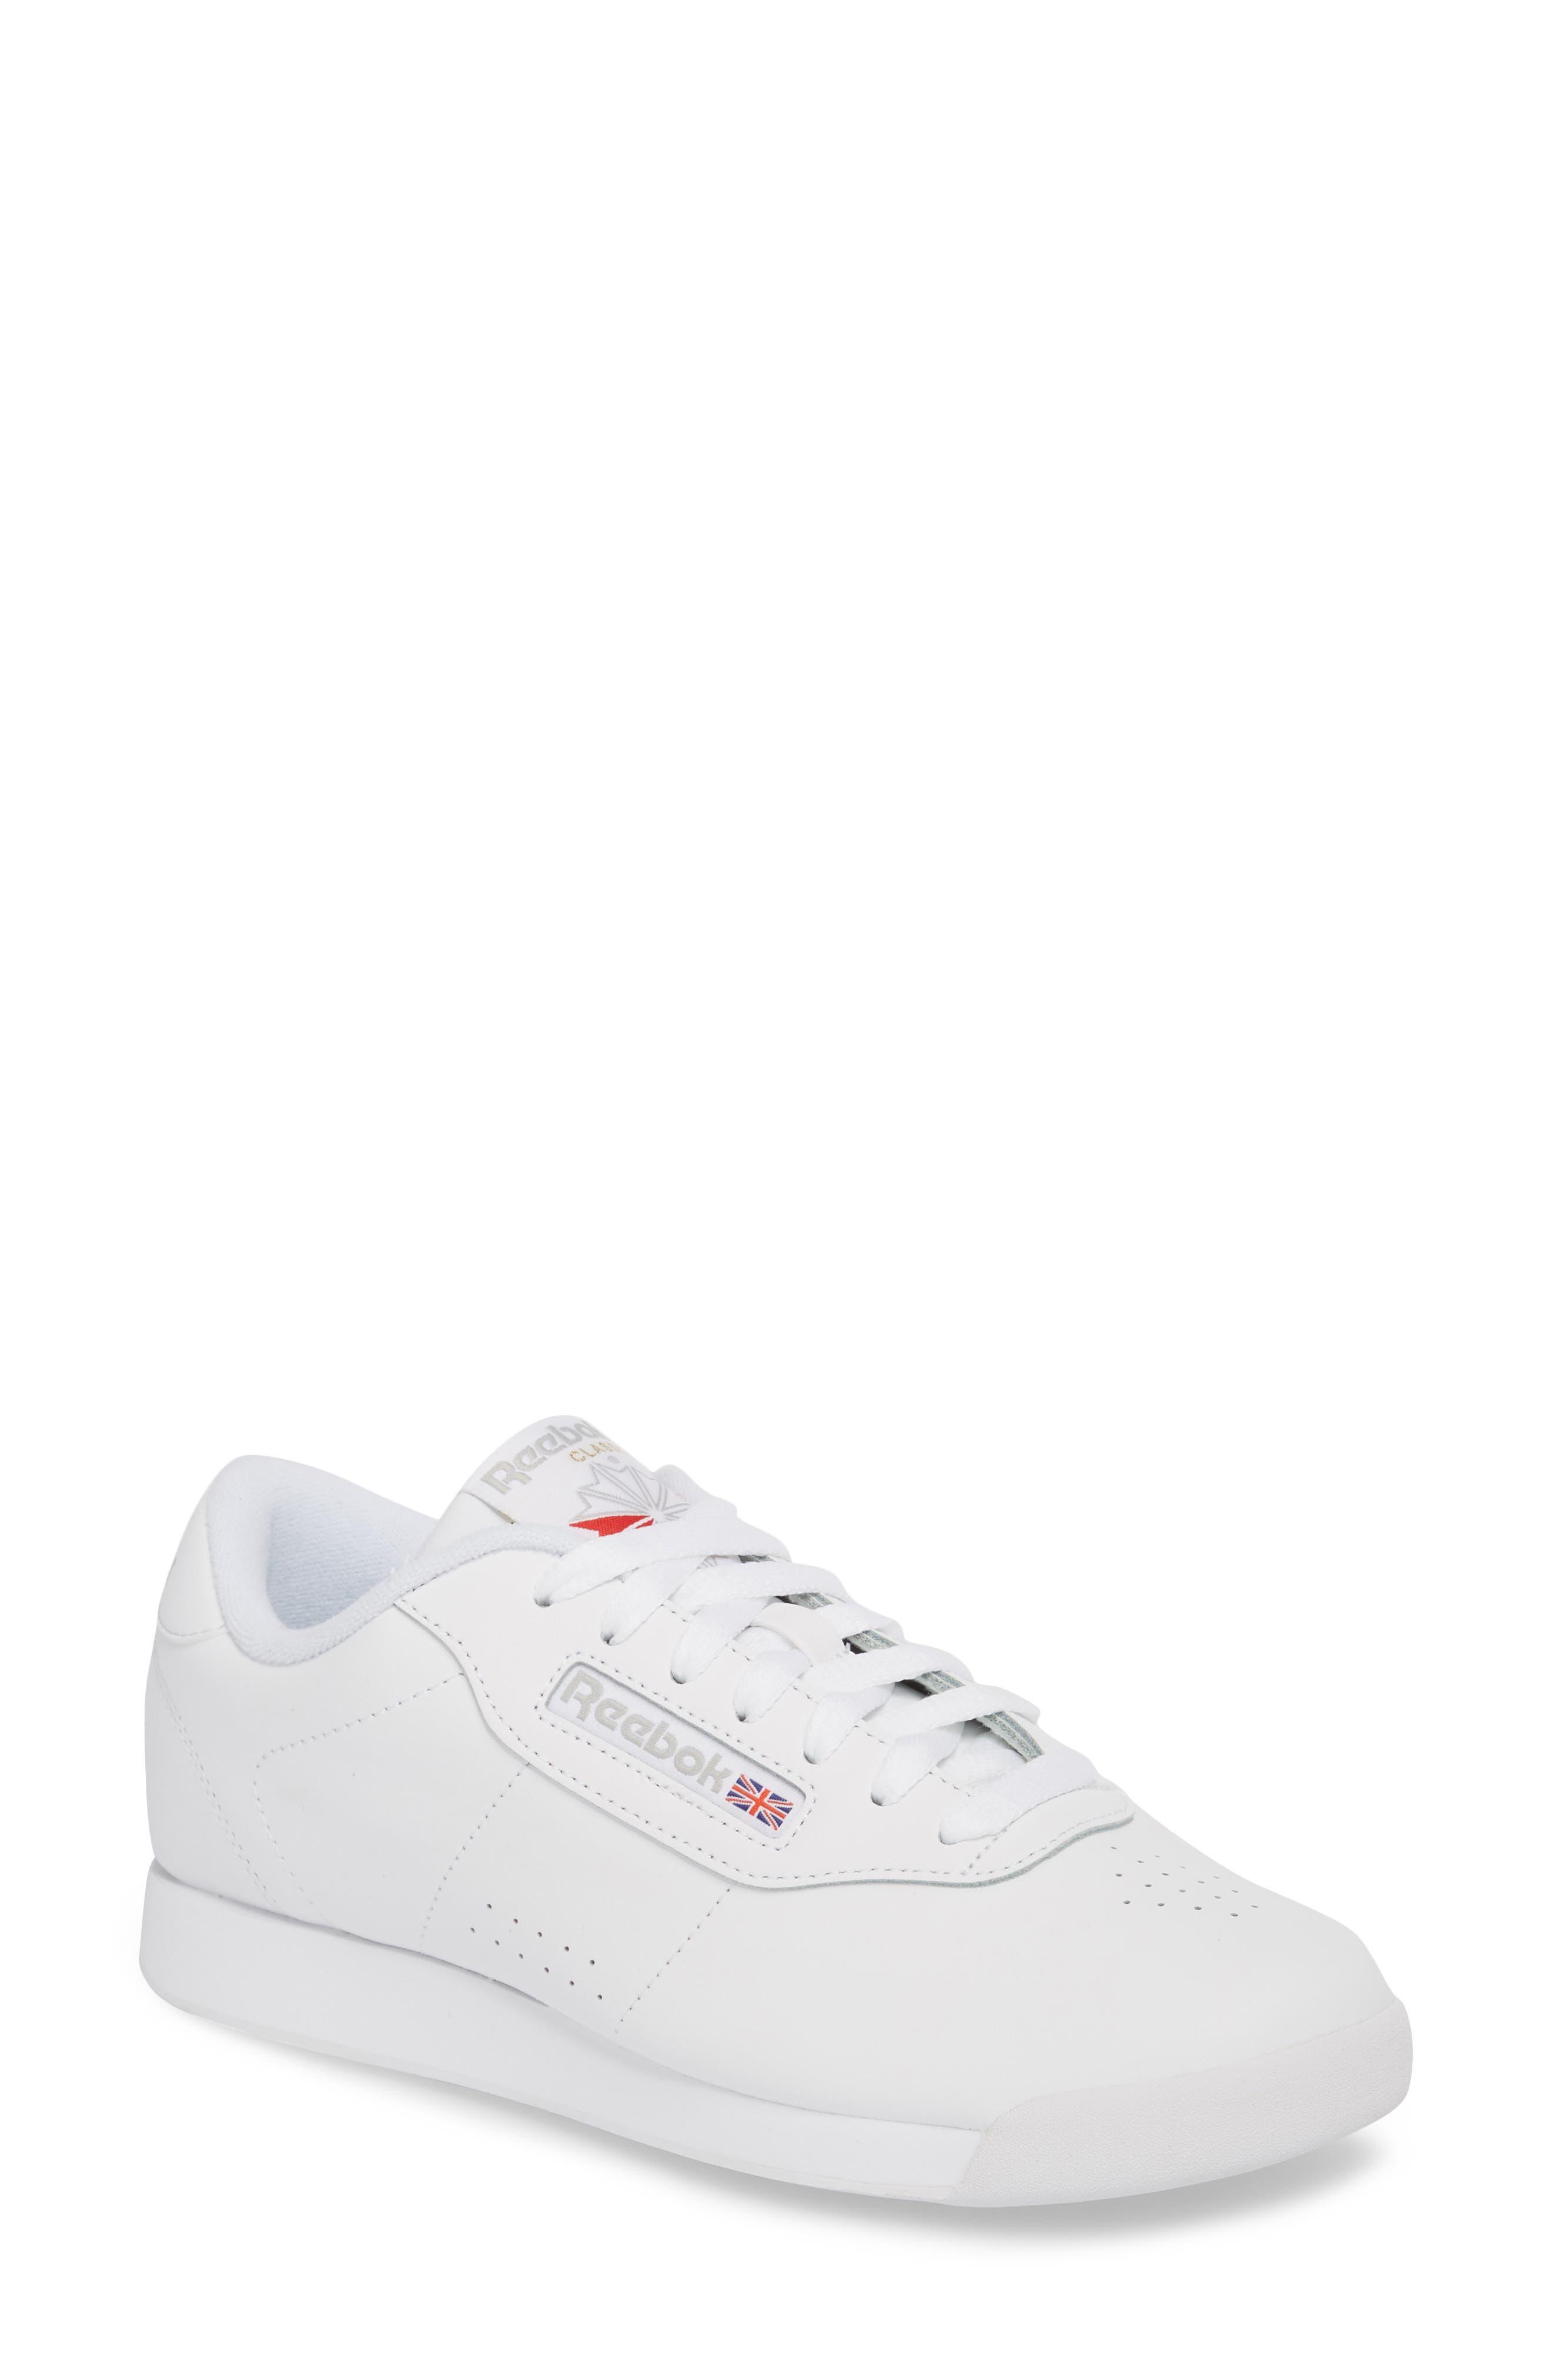 Princess Sneaker,                             Main thumbnail 1, color,                             WHITE